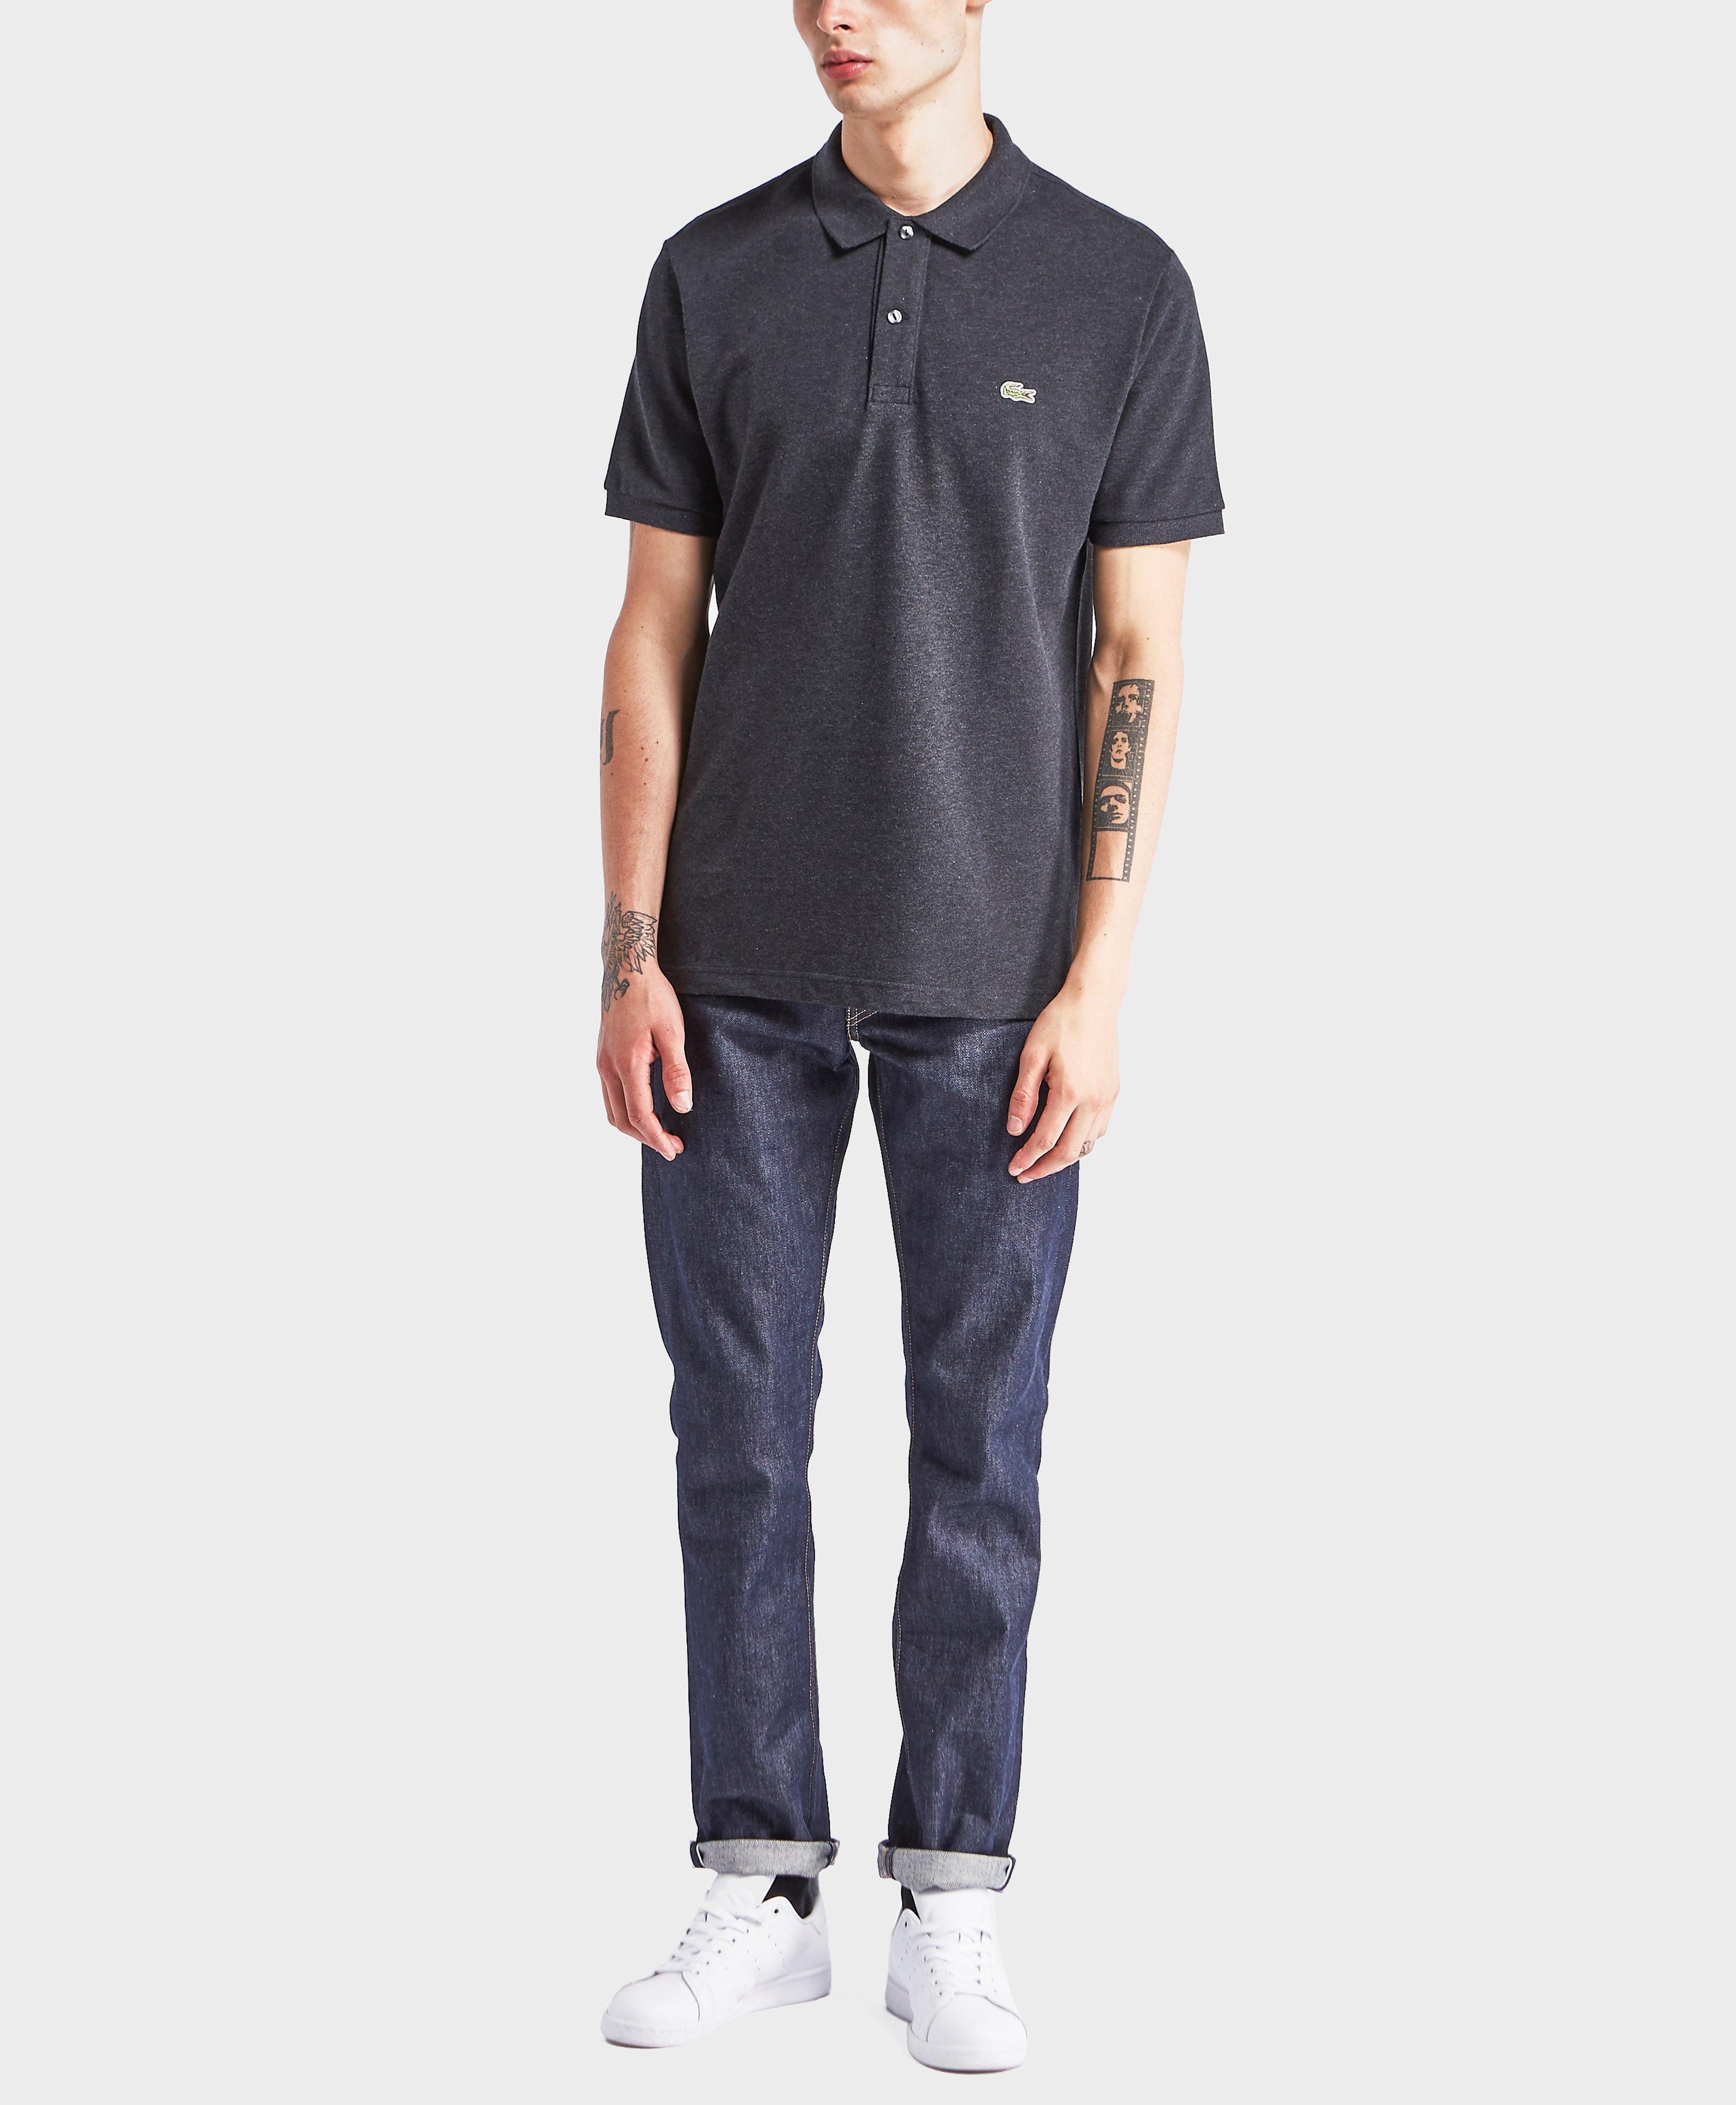 0beb0802d65310 Lacoste 1212 Slim Short Sleeve Polo Shirt for Men - Lyst